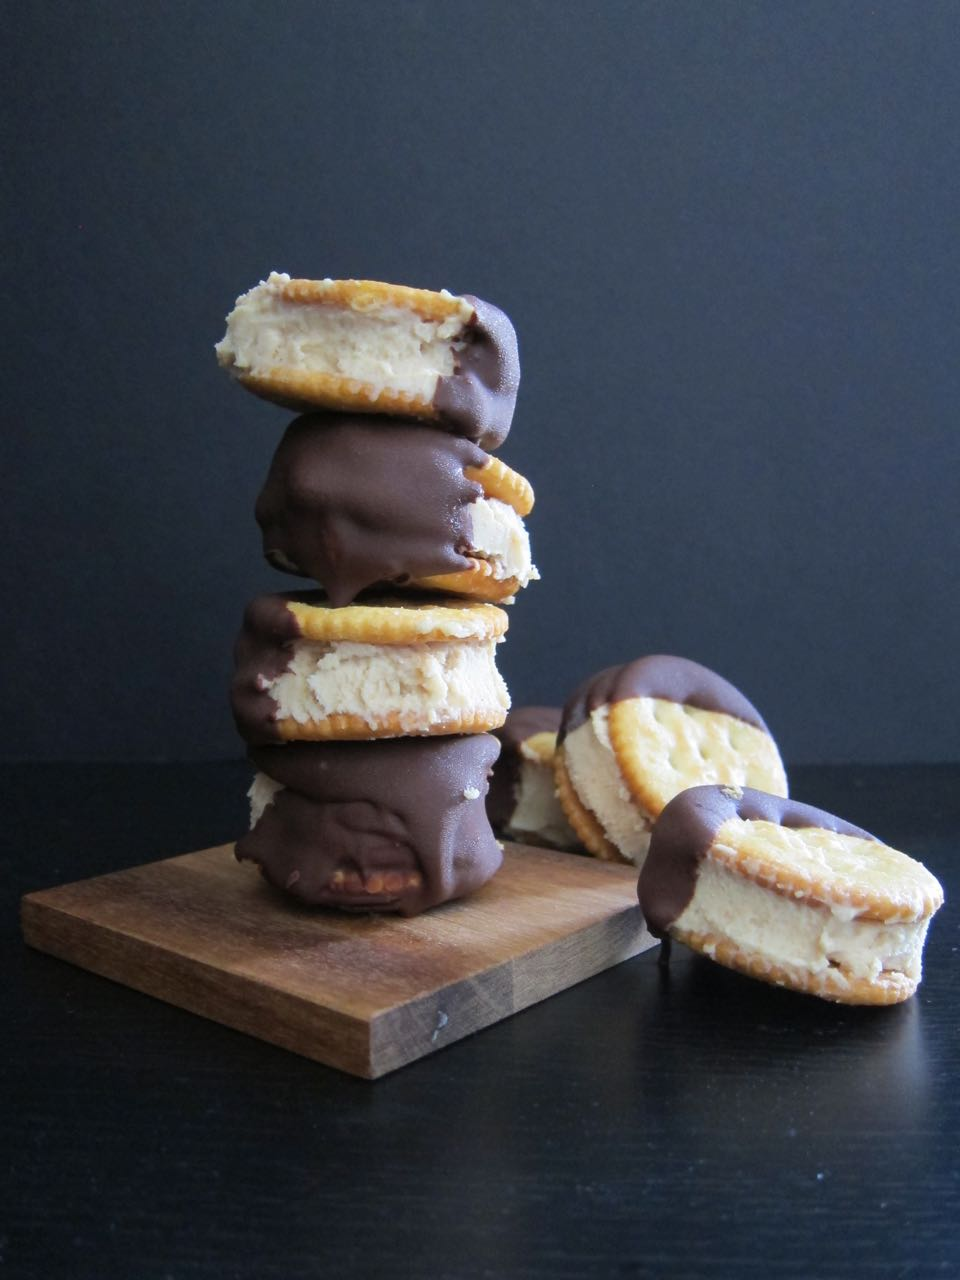 Peanut Butter Ritz Ice Cream Sandwiches